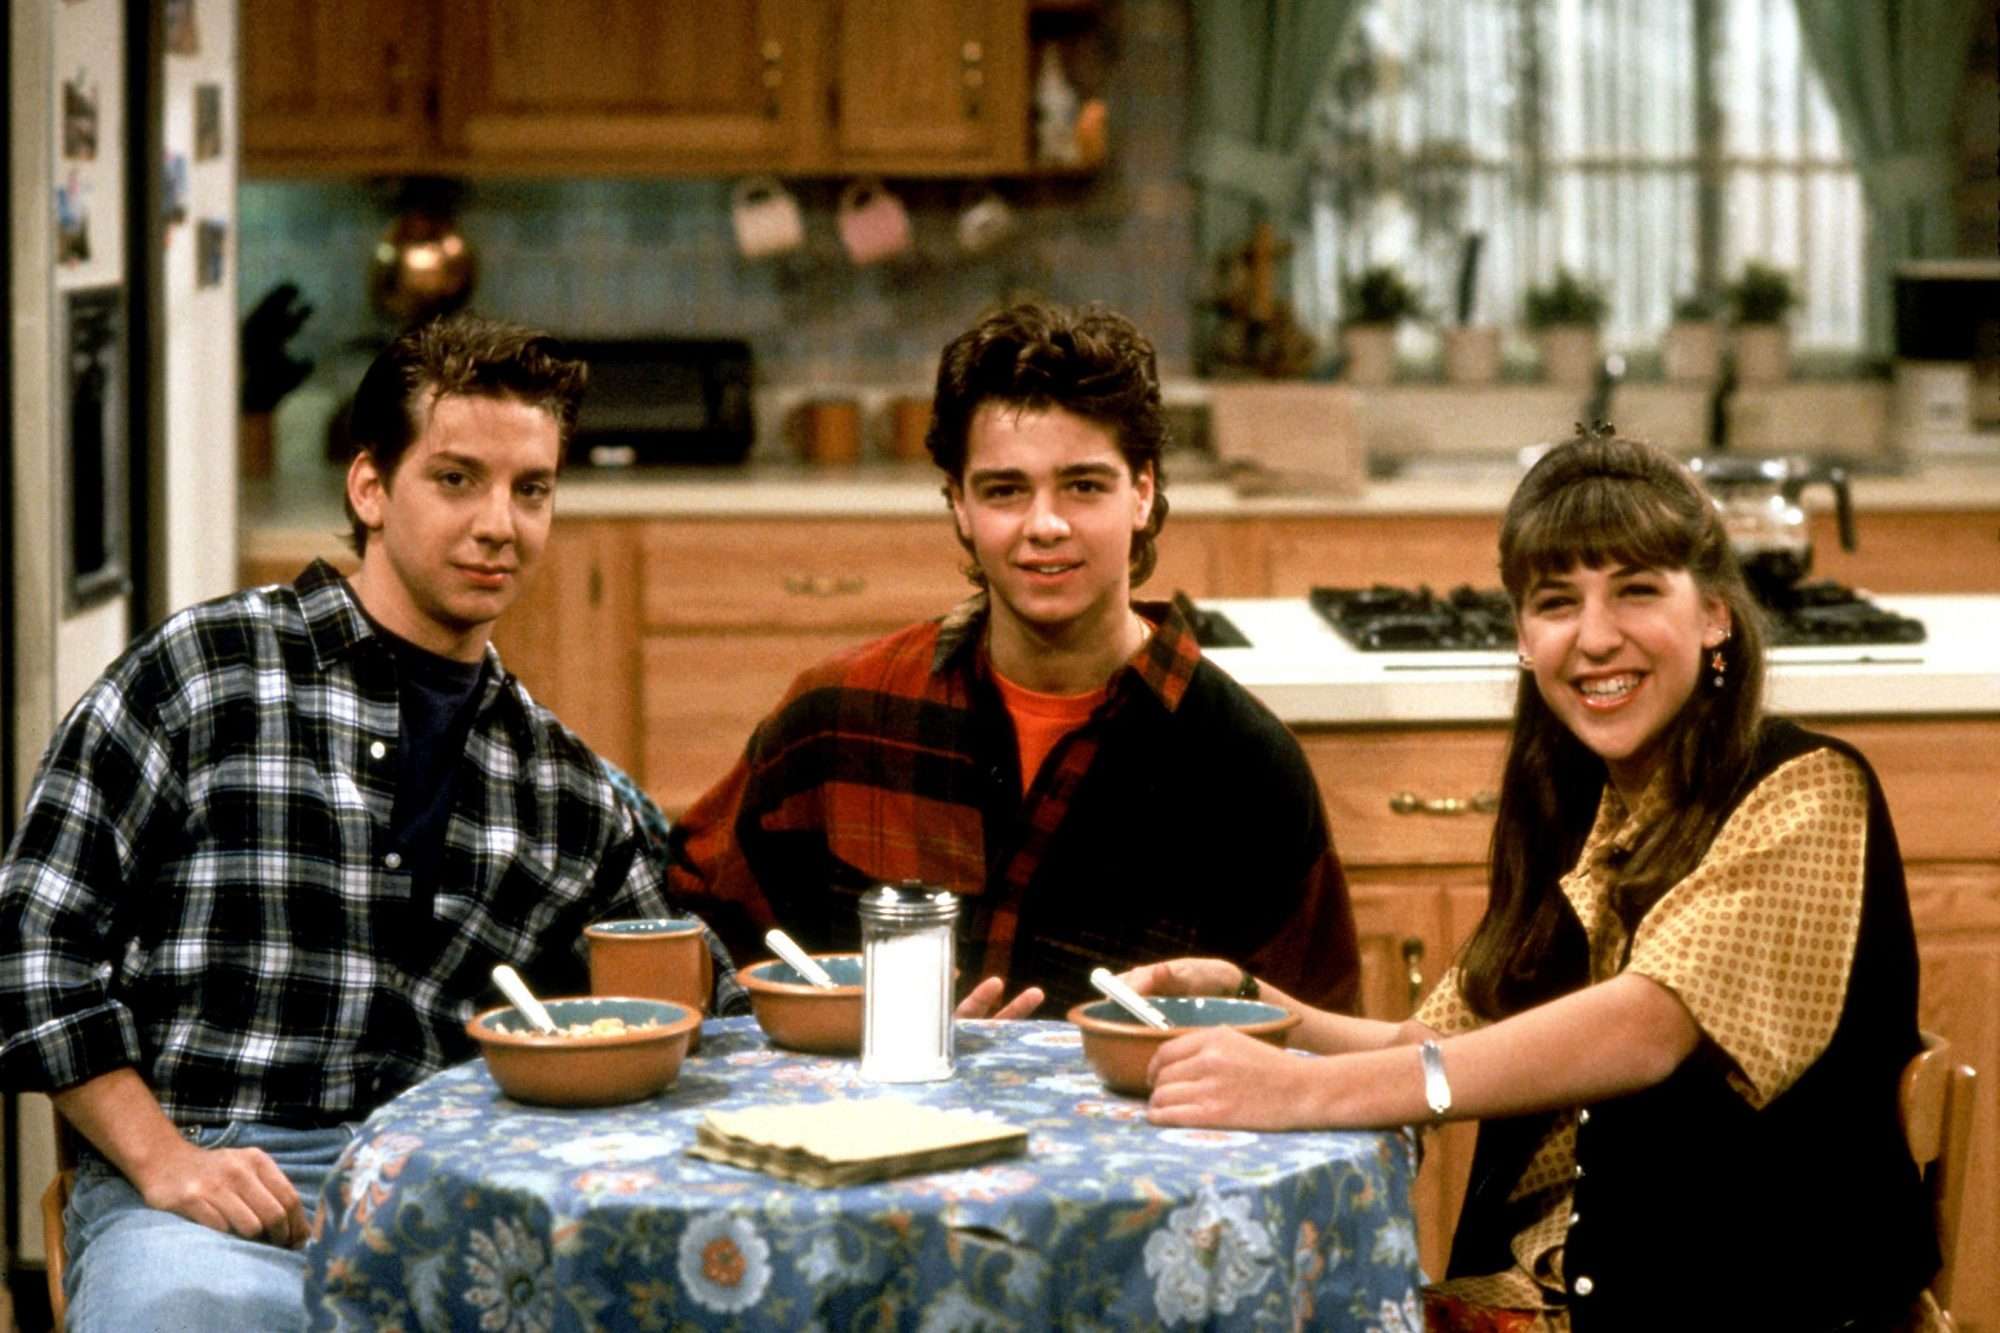 BLOSSOM, Michael Stoyanov, Joey Lawrence, Mayim Bialik, 1991-95, © Touchstone Television / courtesy